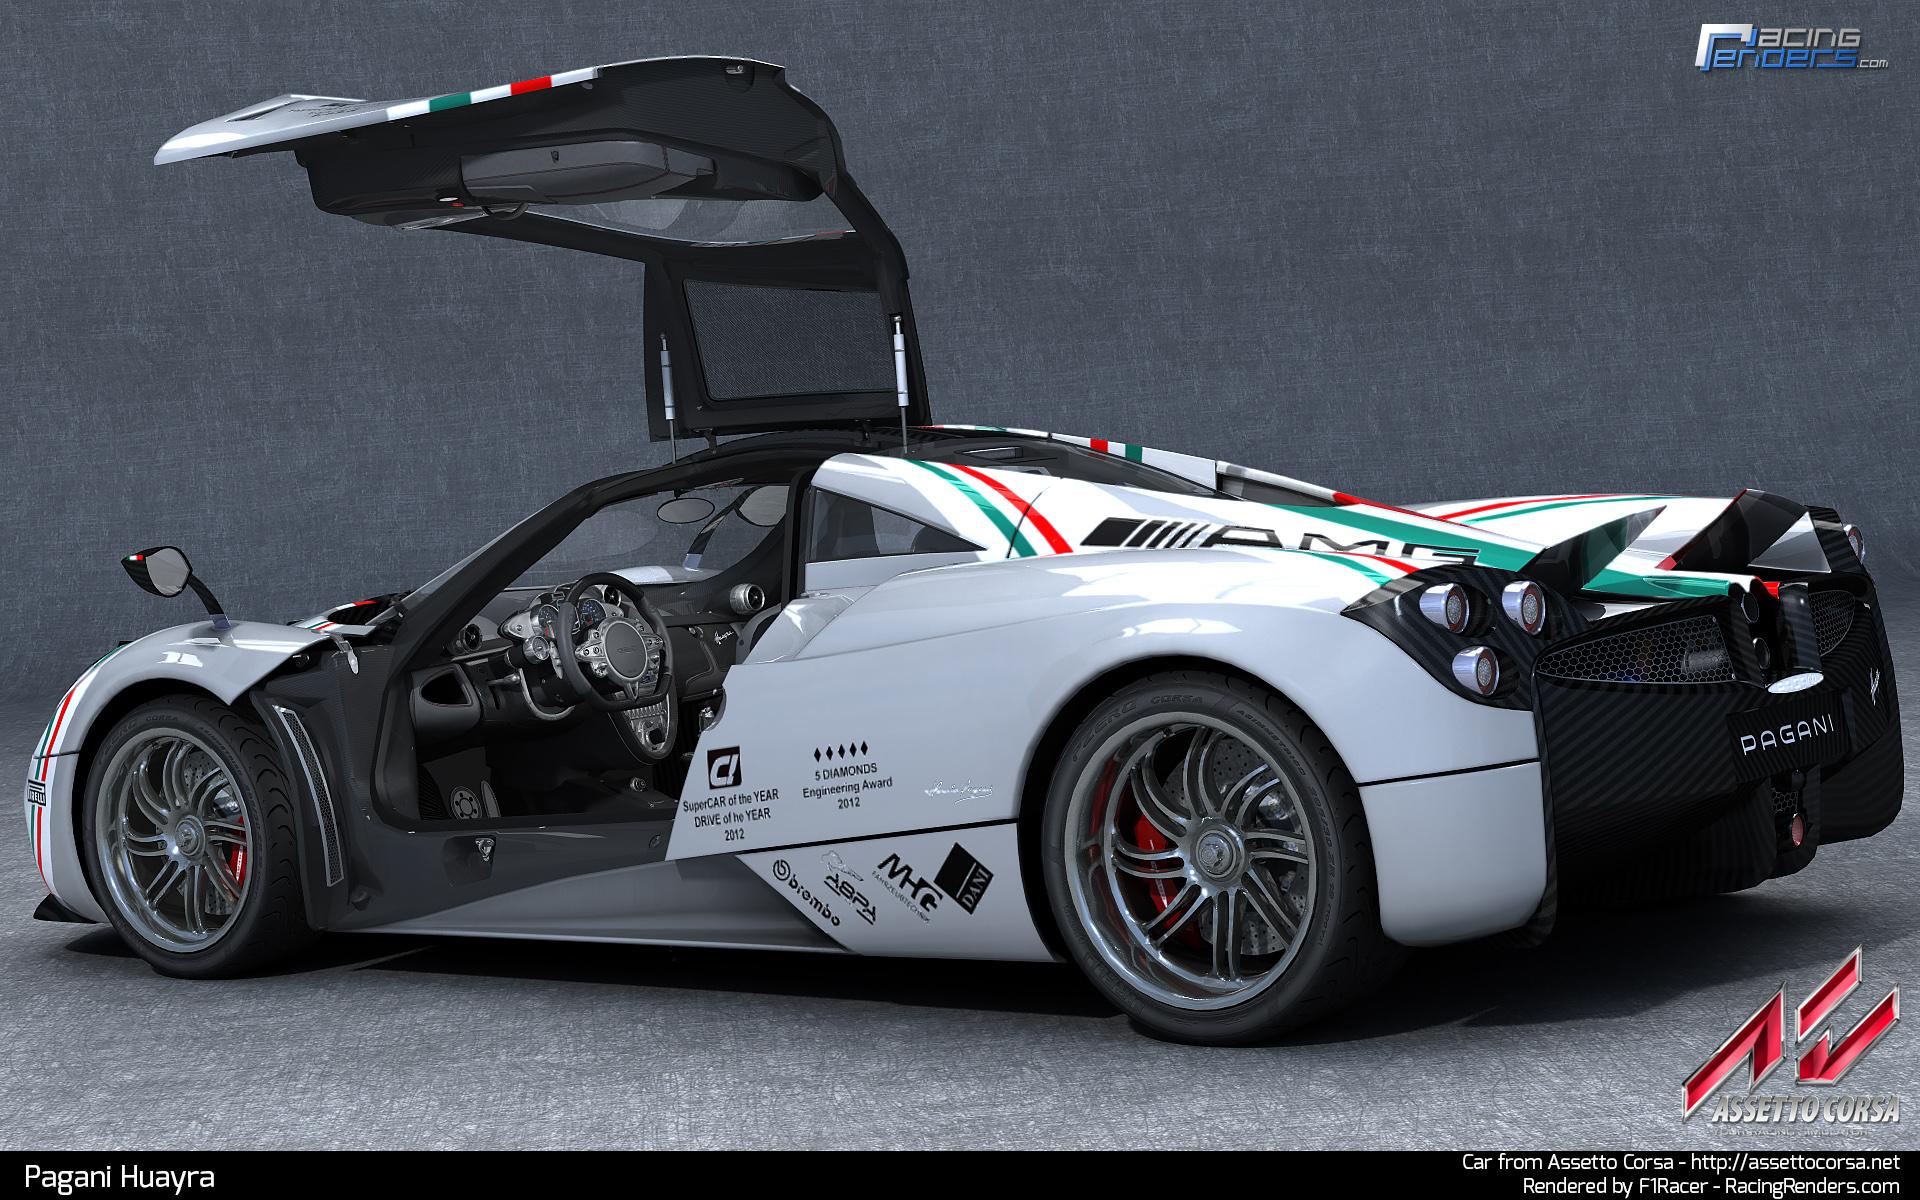 etto Corsa – Pagani Huayra Renders – VirtualR.net – Sim Racing